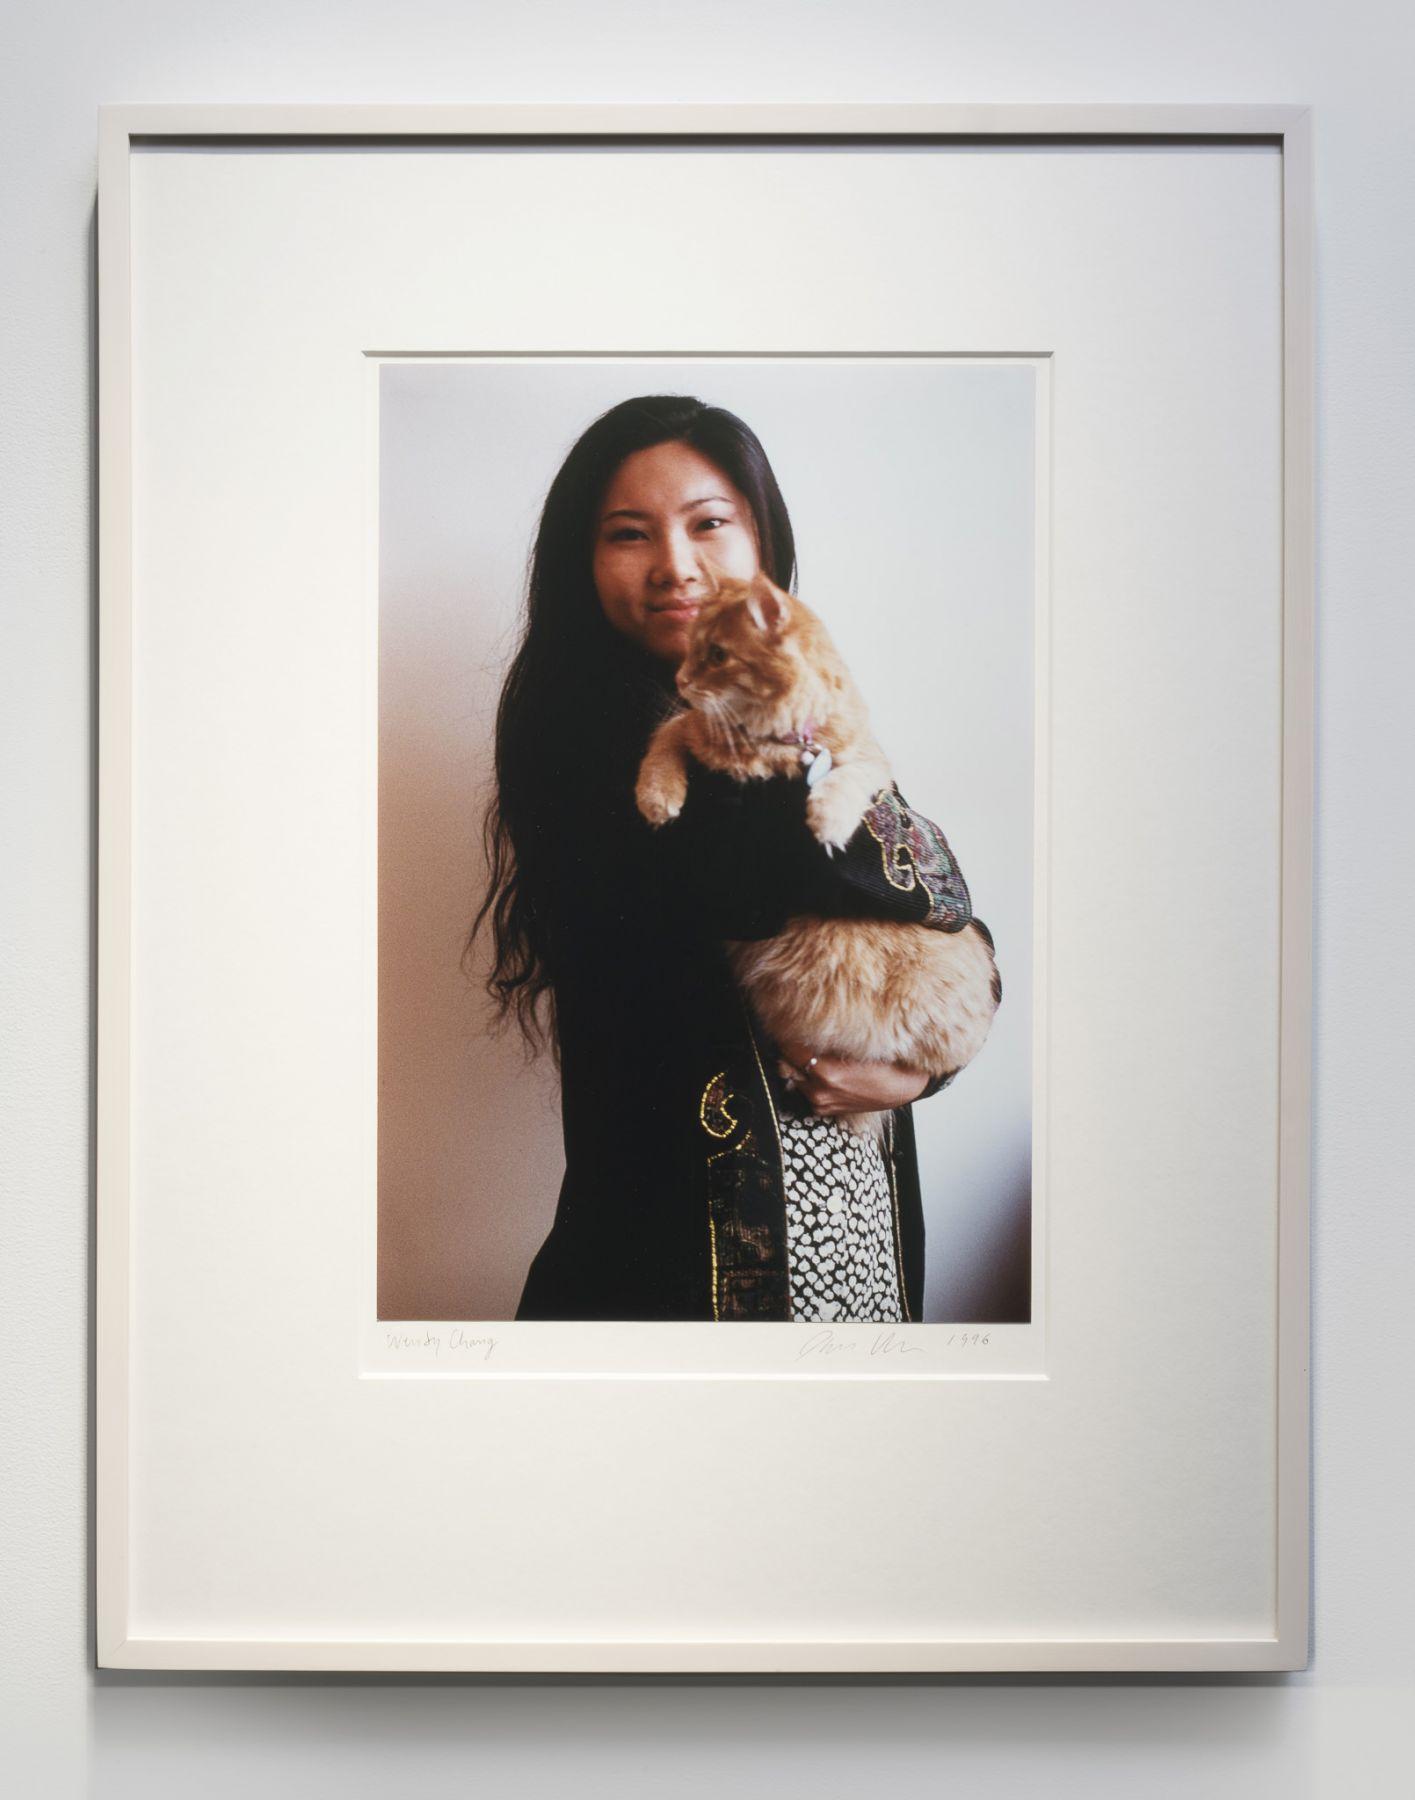 Dan Graham, Wendy with Cat, 1996